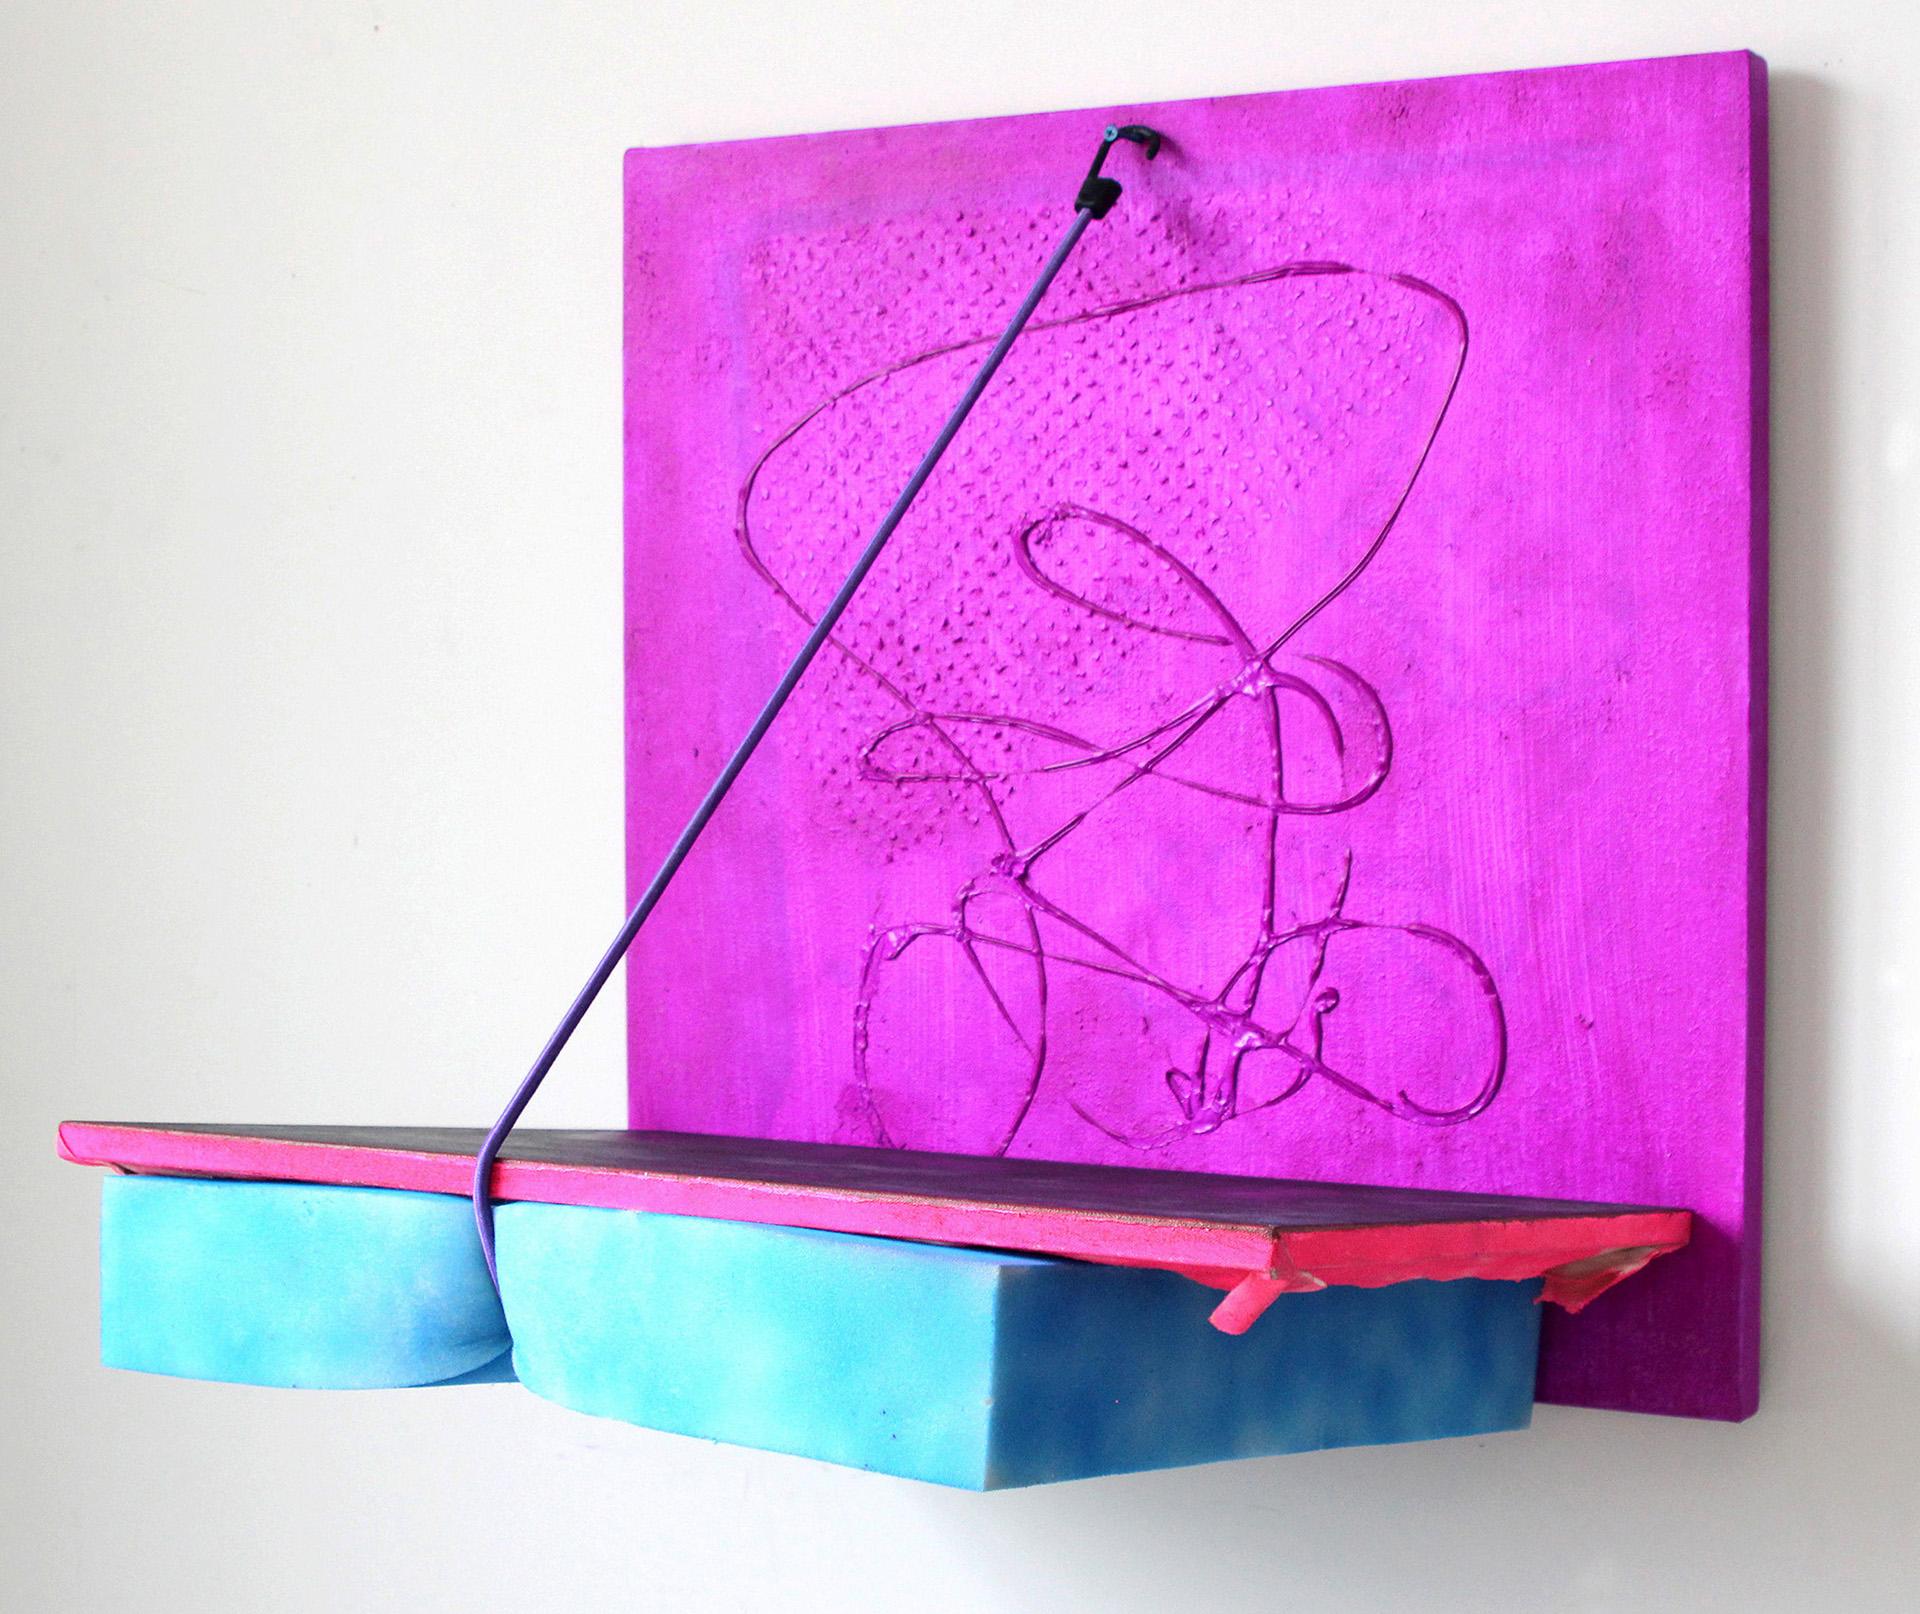 Shelf , 2015, acrylic and spray paint on canvas, foam, bungee cord, screw